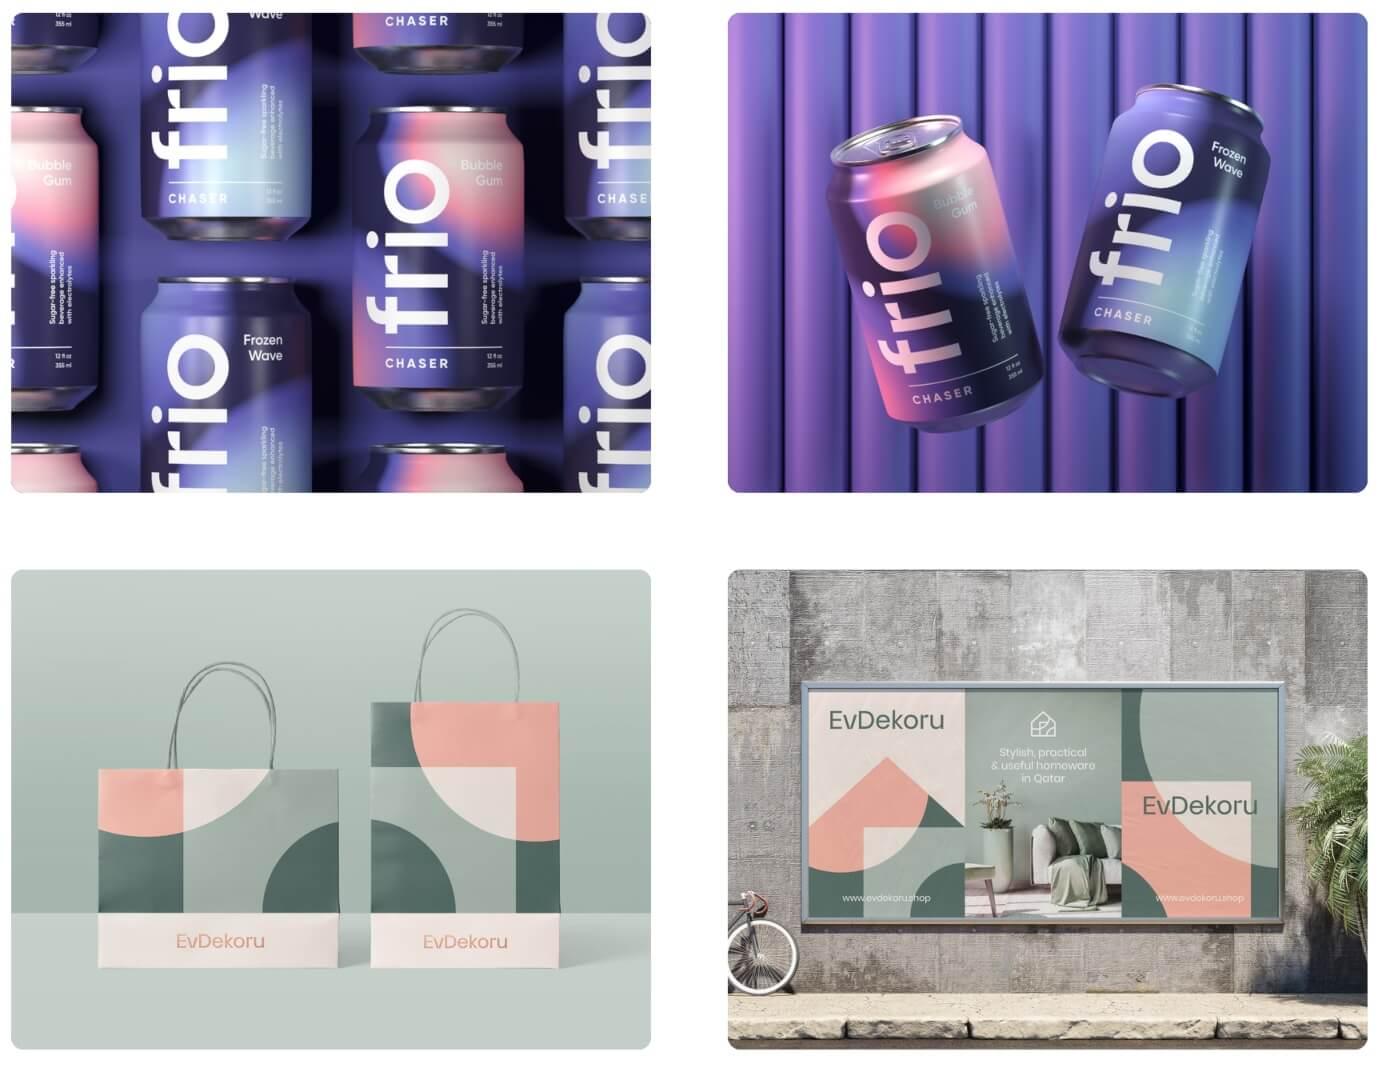 packaging graphic design by Alex Spenser